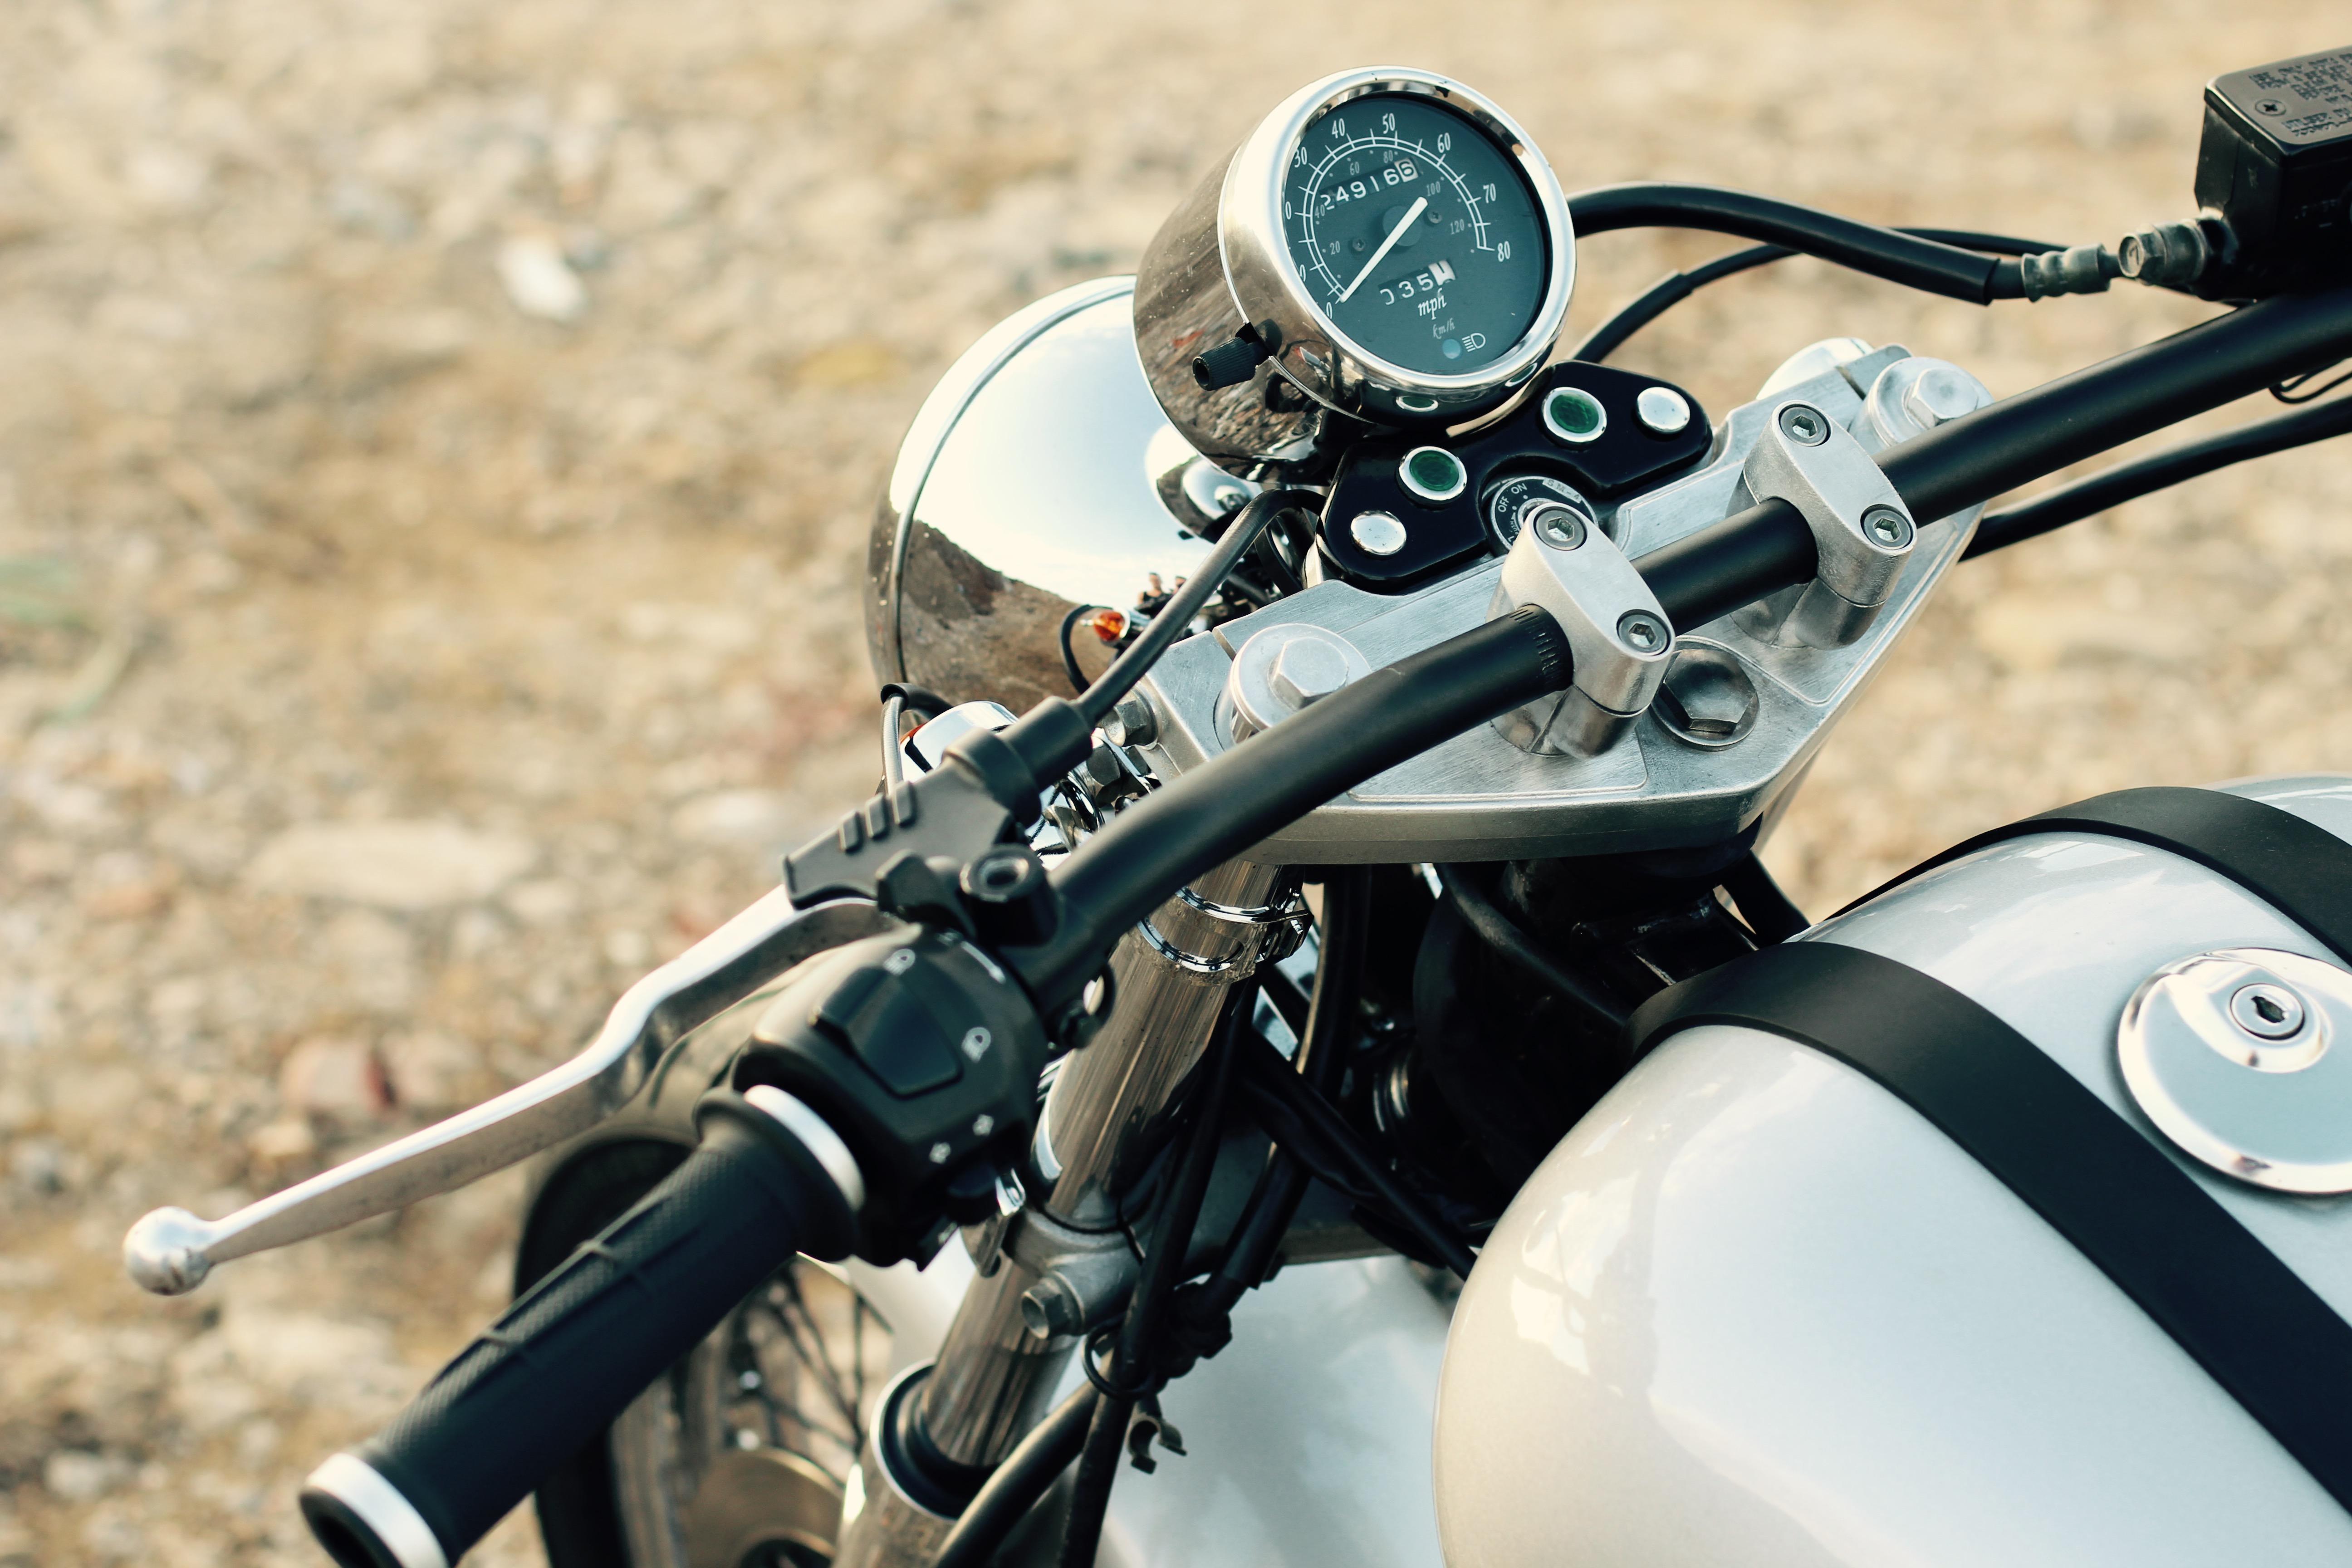 twinthing-2017 | 'Silver Bullet' Suzuki GZ125cc